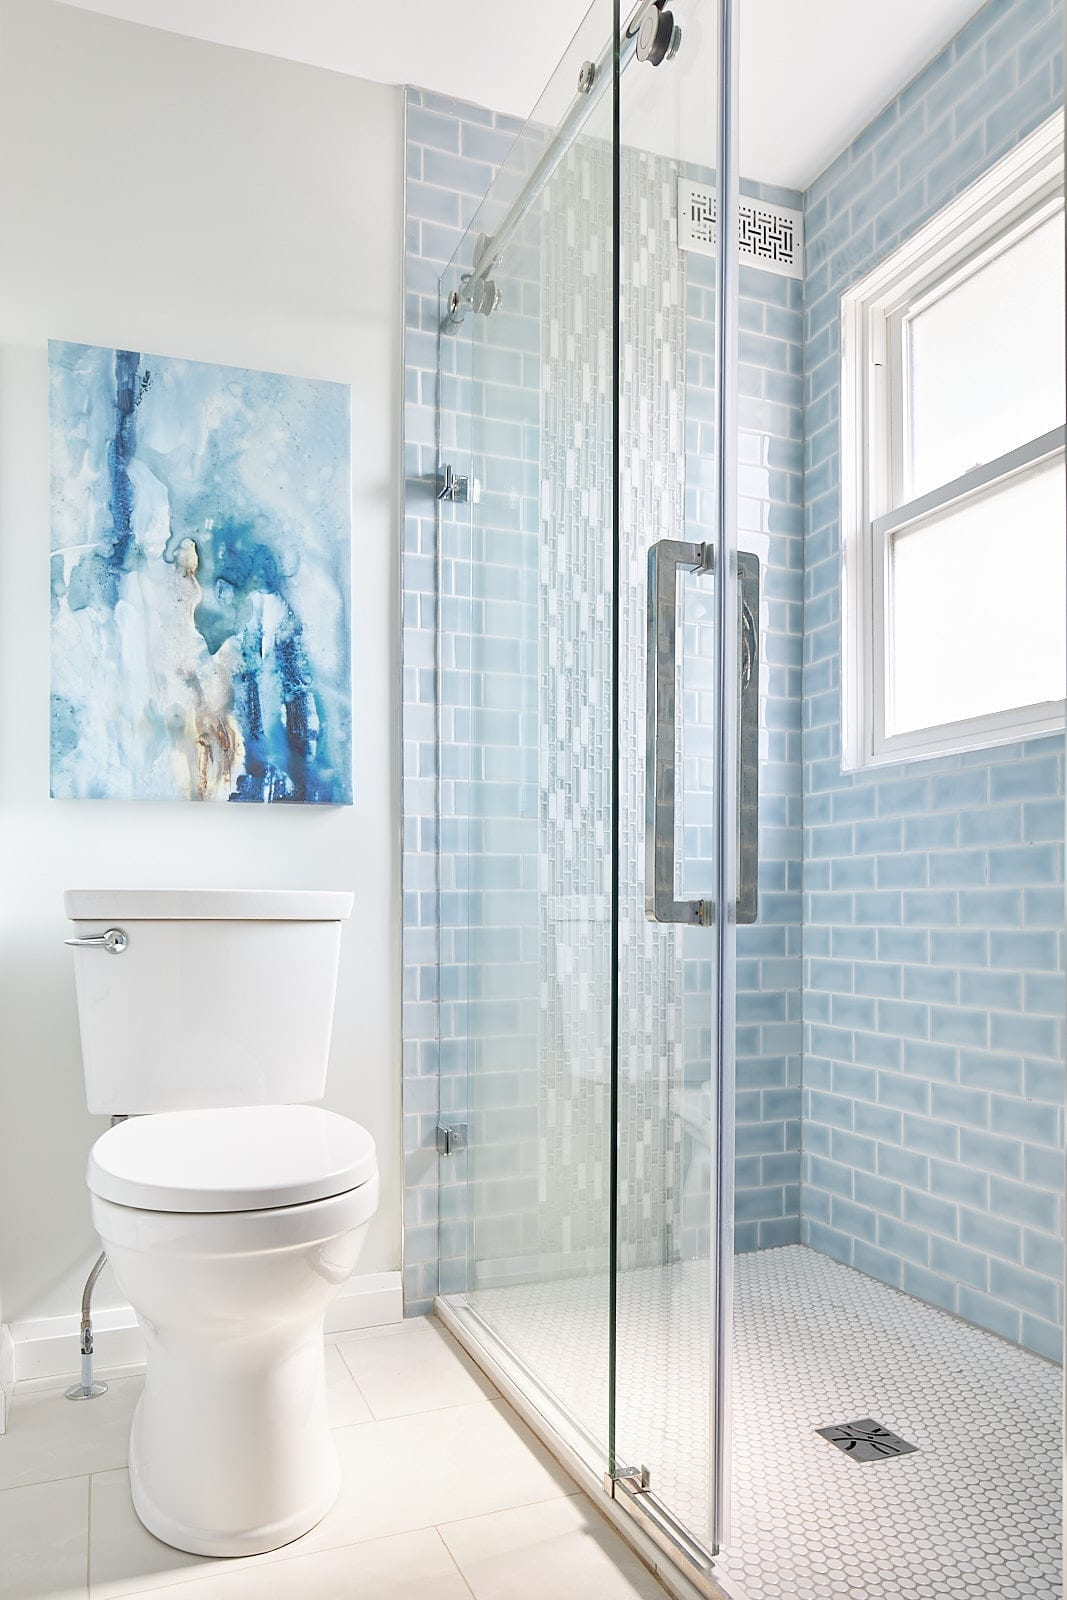 Bathroom designed by Pamela Lynn Interiors